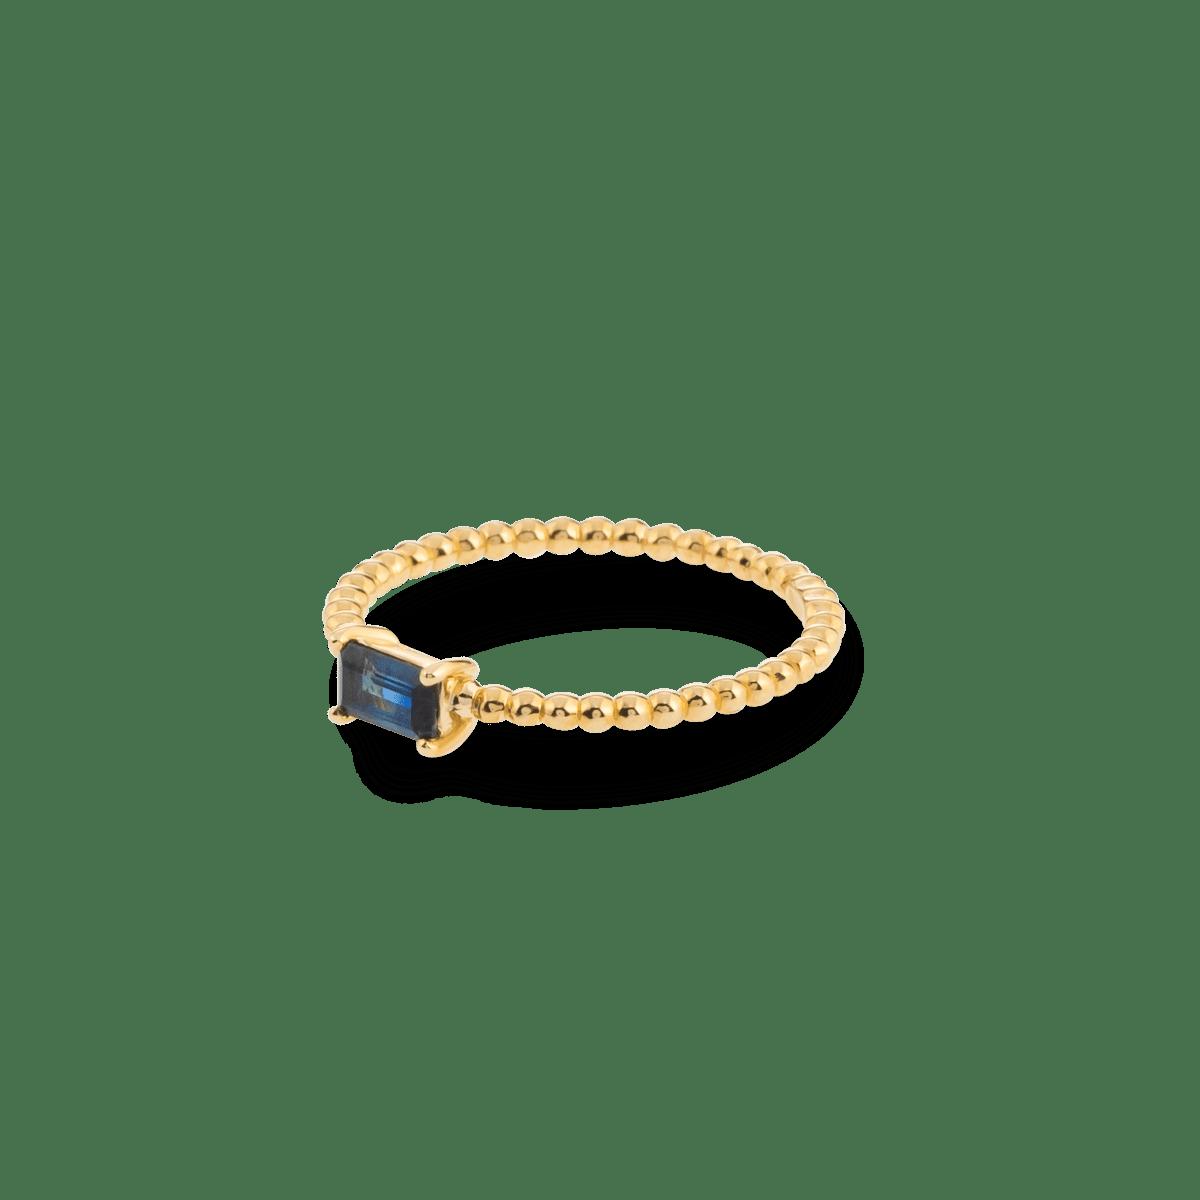 Bubble Birthstone Ring 9K gold june